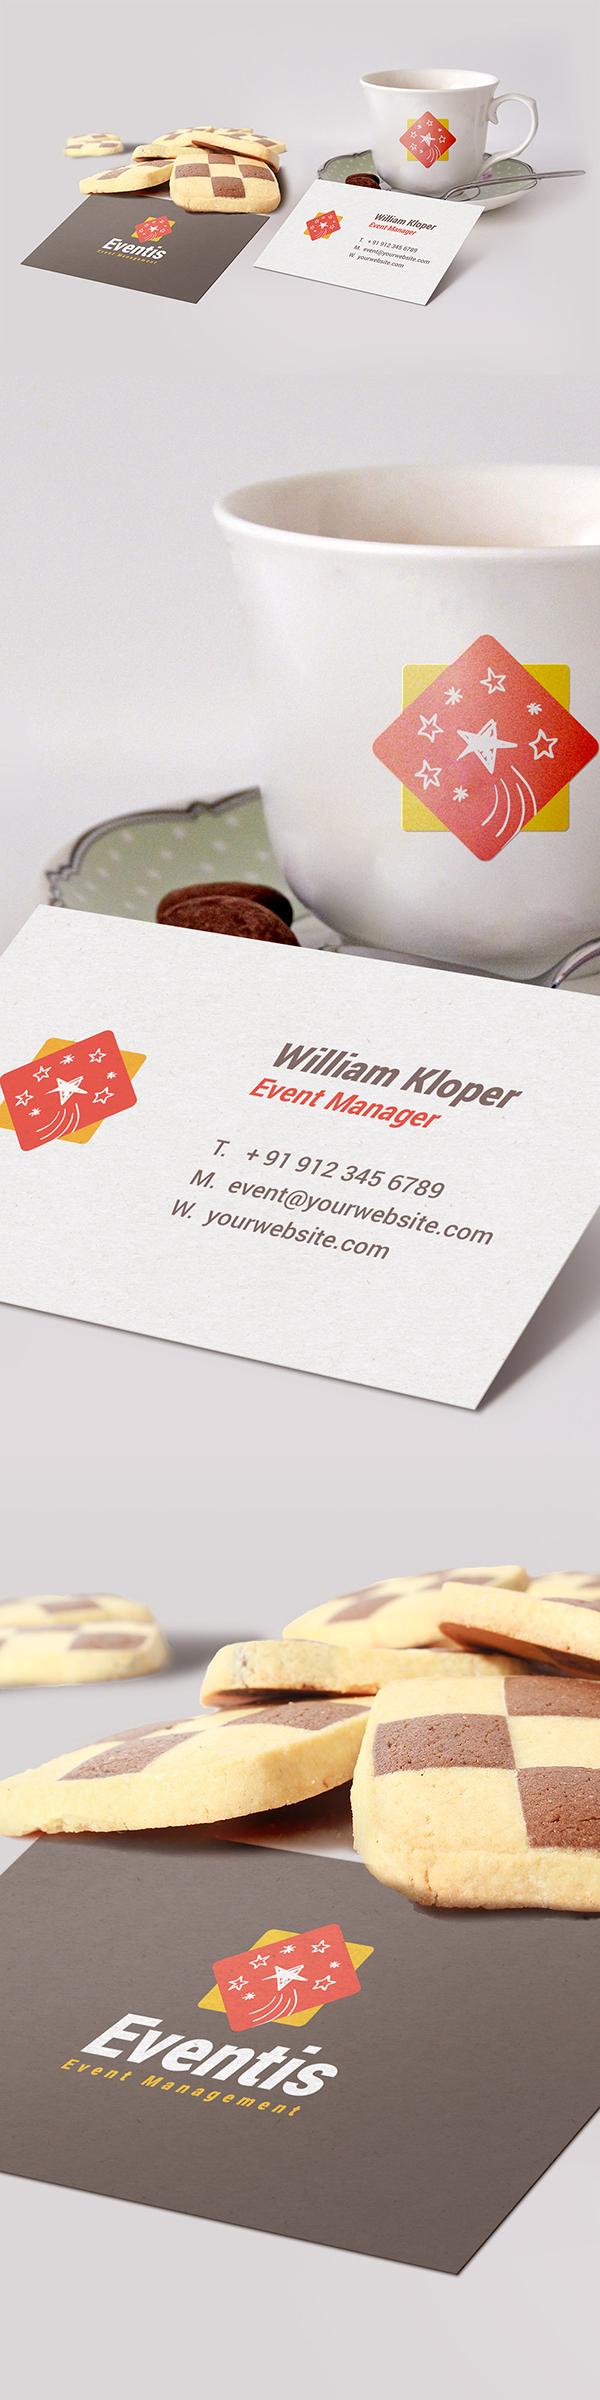 29 Free Business Card & Coffee Cup Scene Mockup